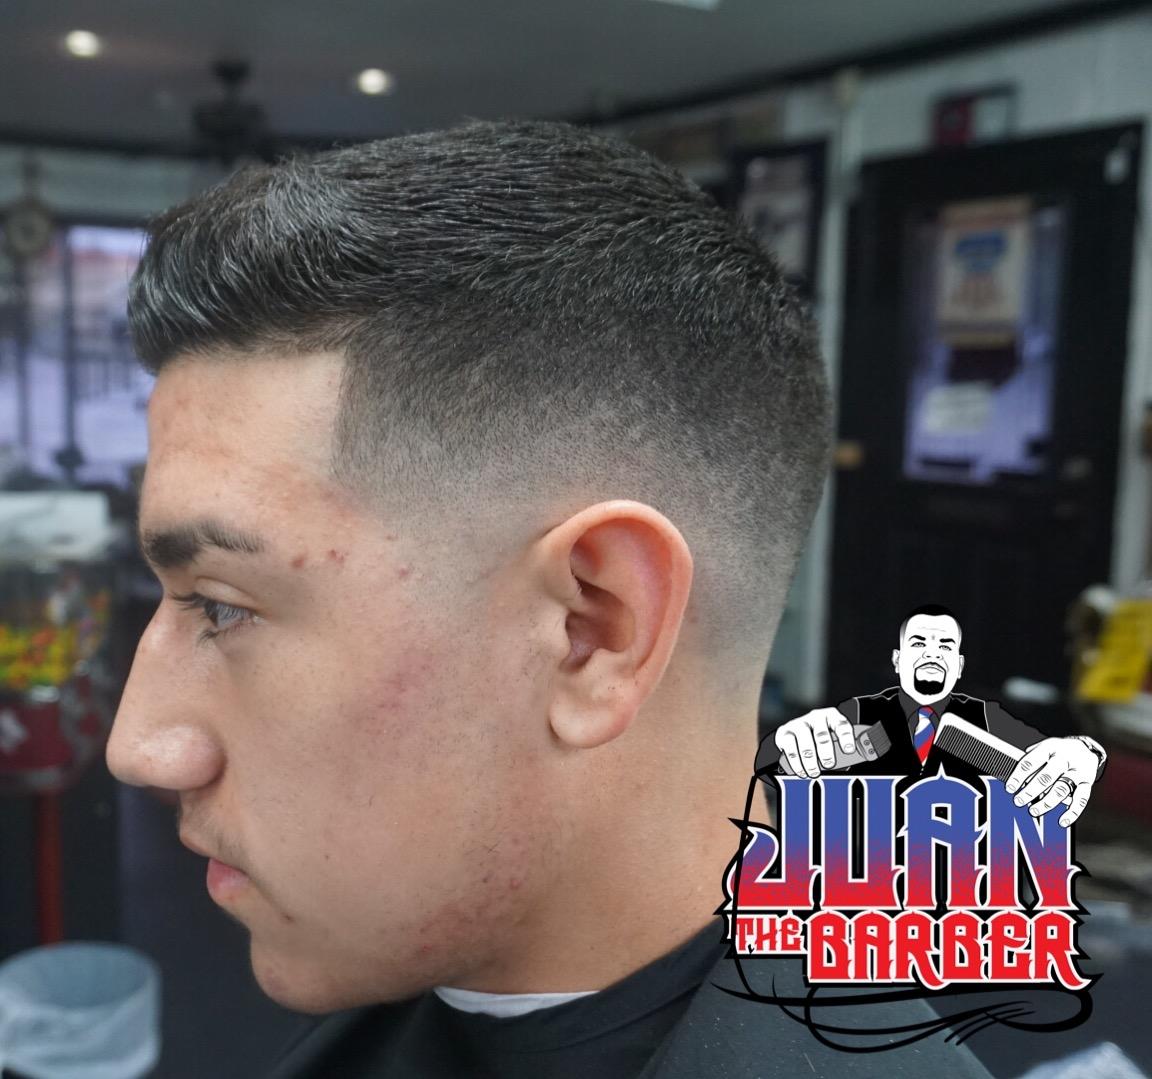 lone Star Barber Shop image 5